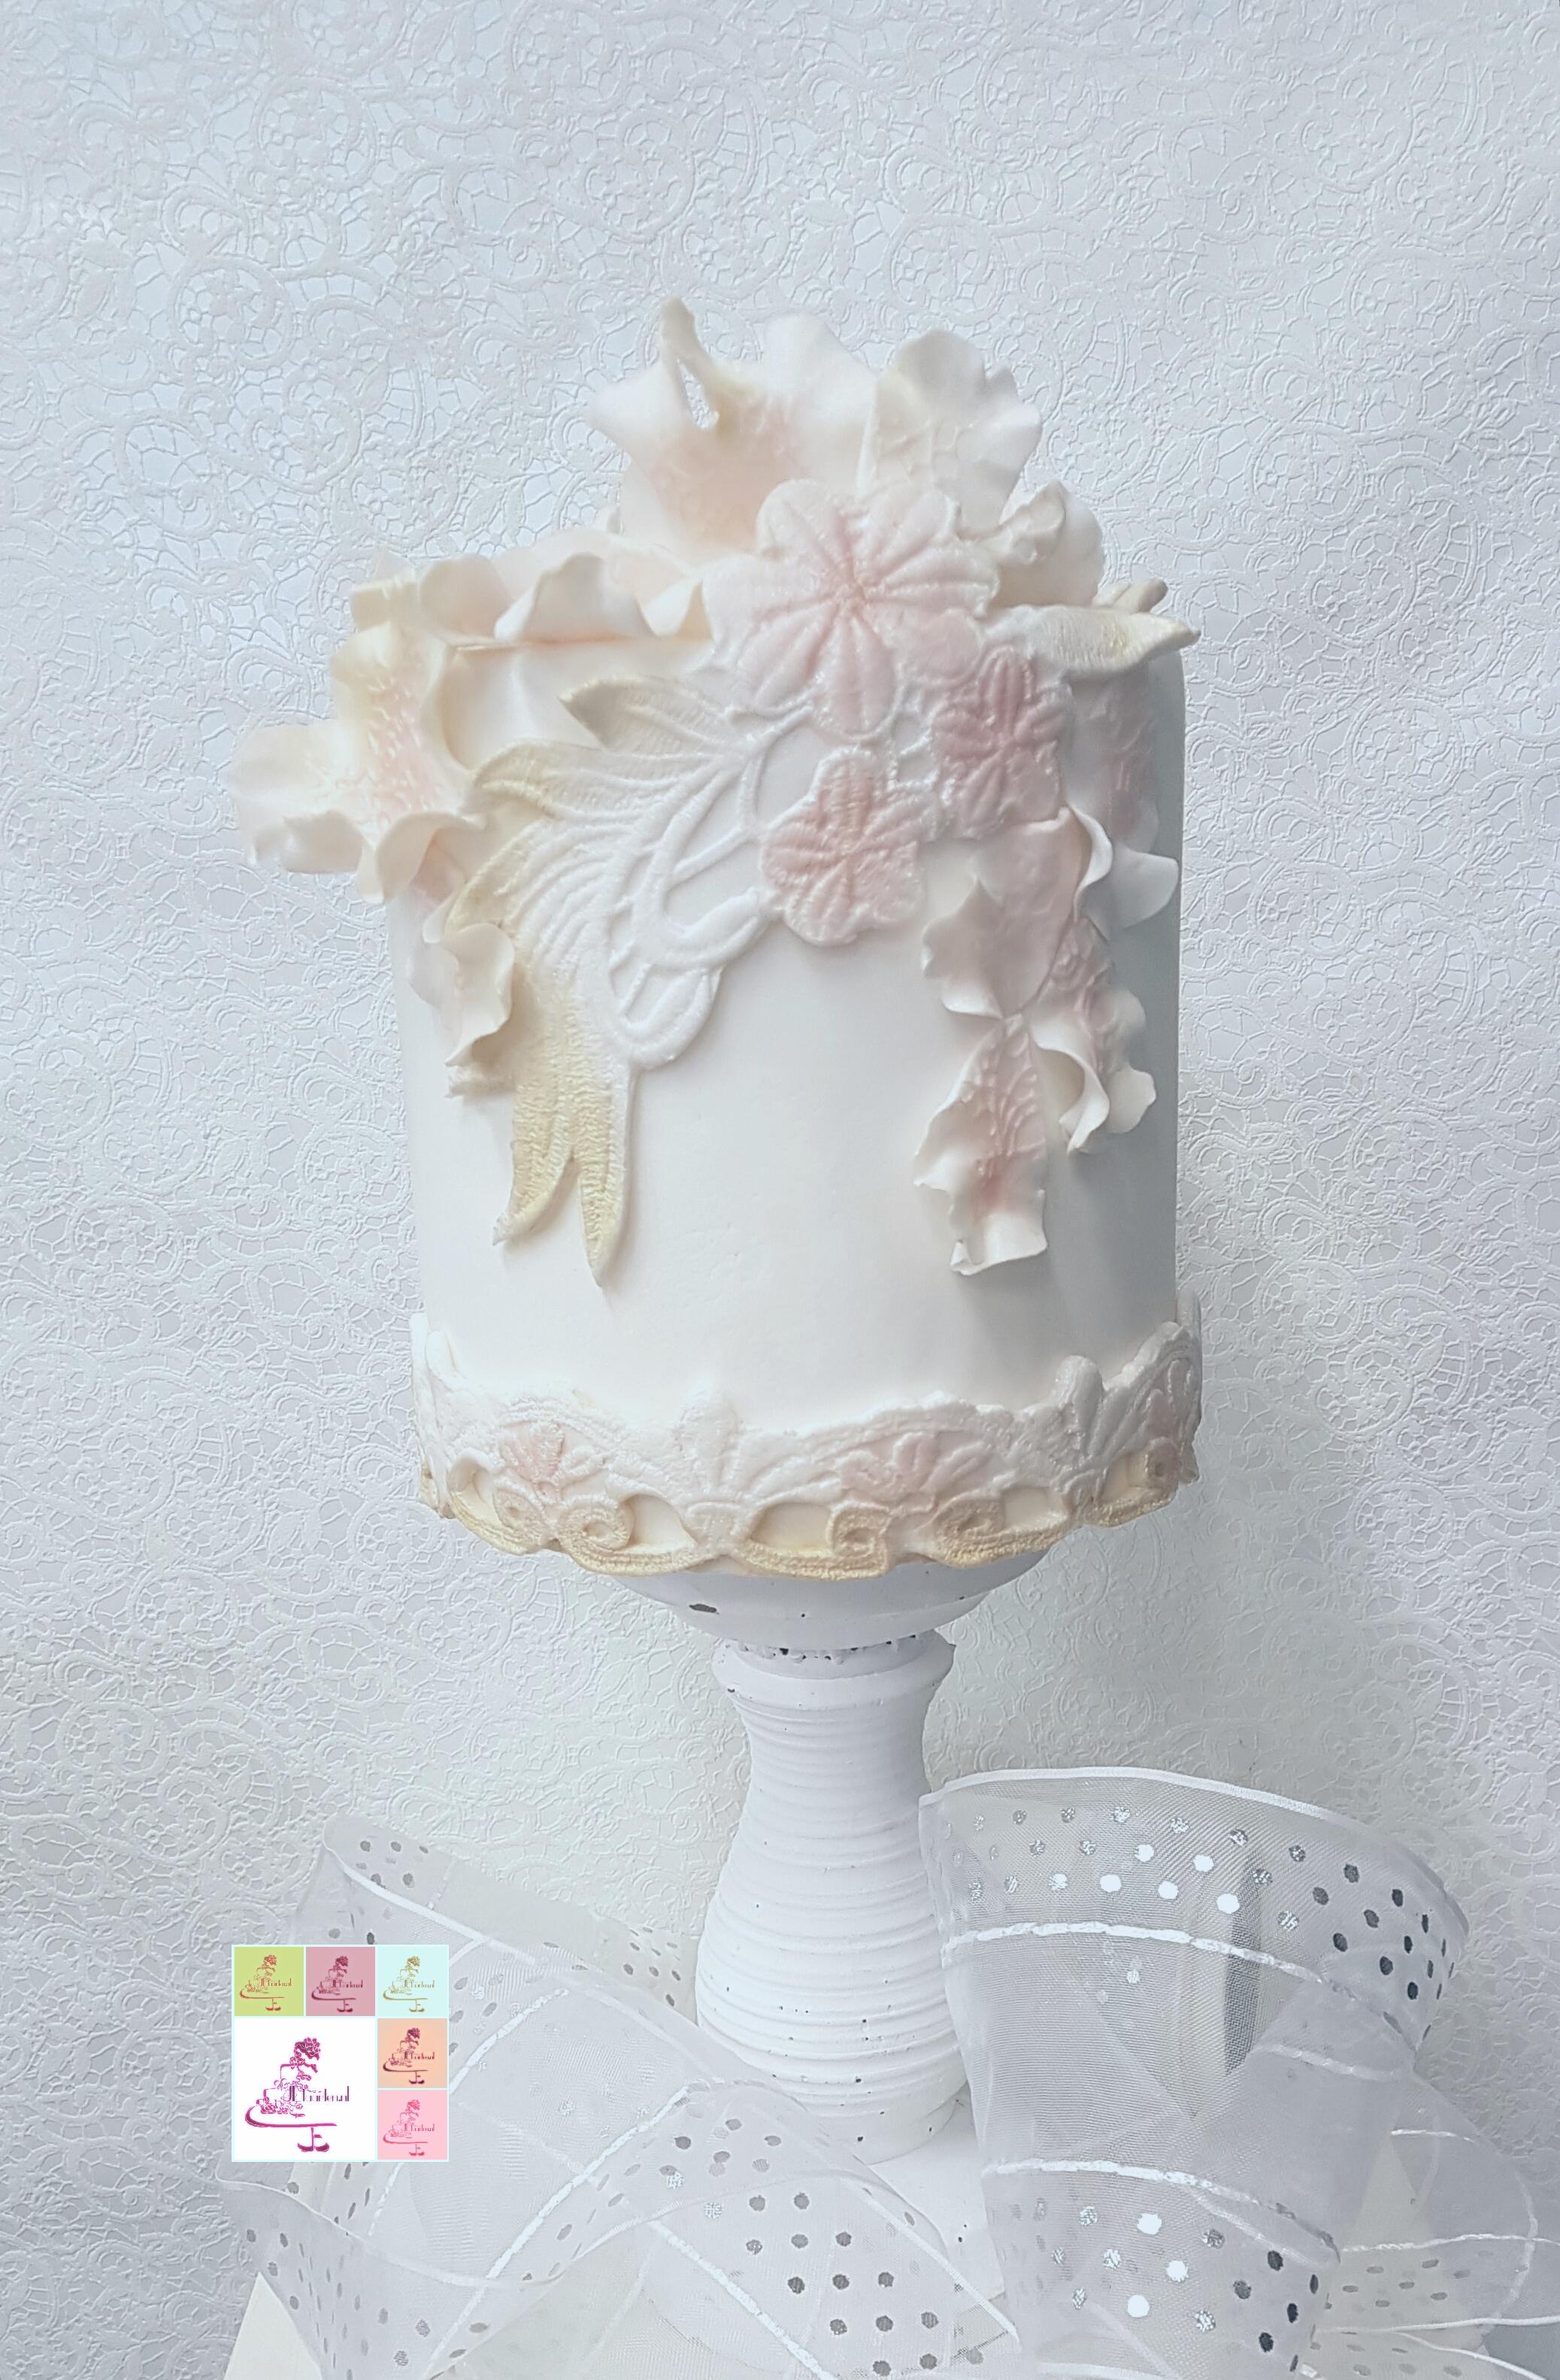 Judith Emmelkamp J Etaartan Wedding Elegant 0